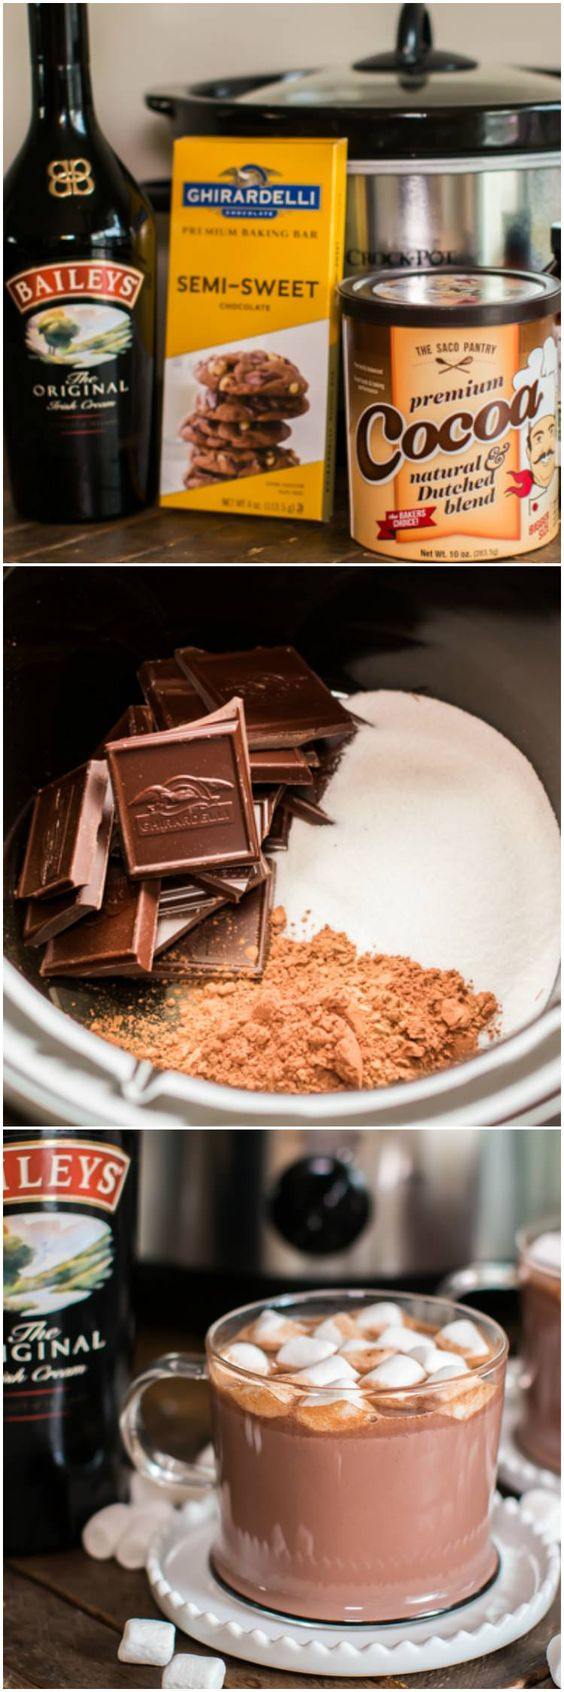 Slow Cooker Baileys Irish Cream Hot Chocolate. I'm making this for Christmas!: